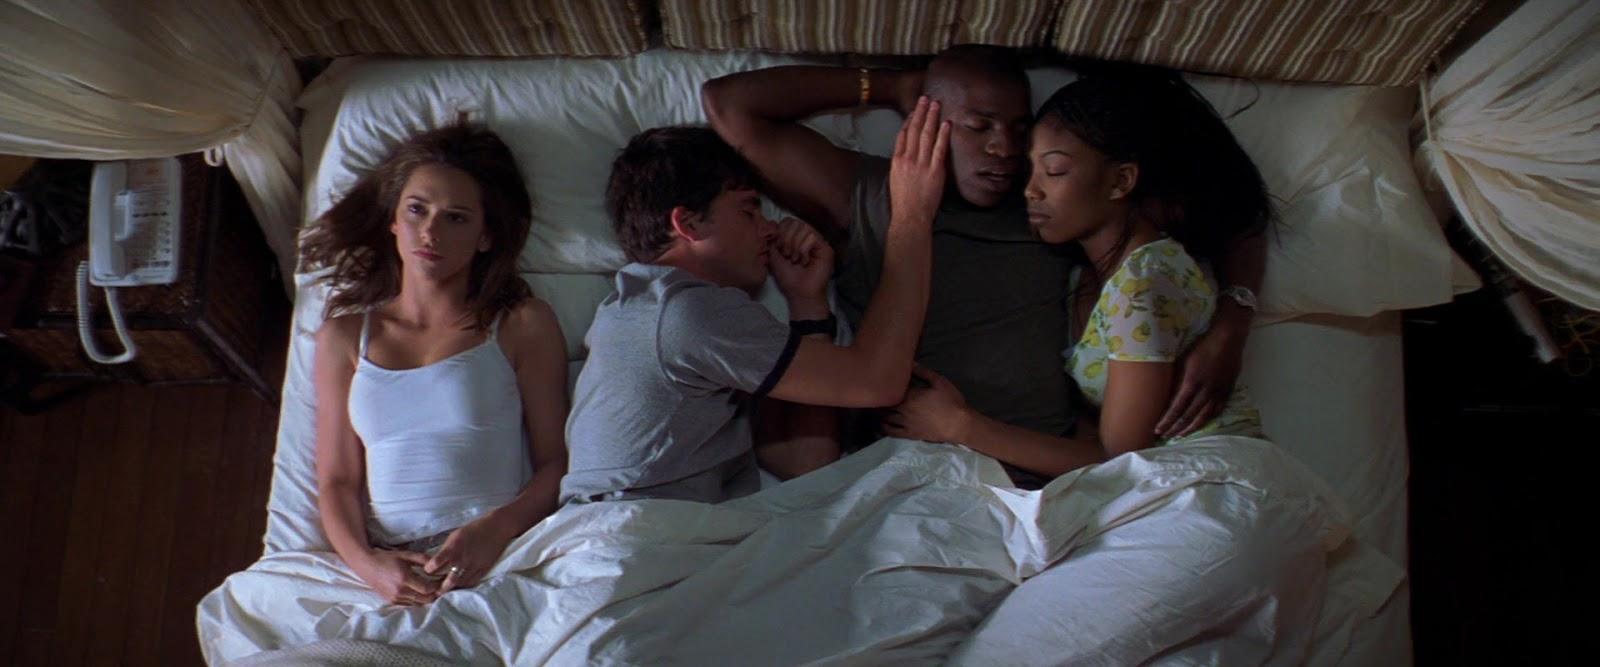 Jennifer Love Hewitt, Mekhi Phifer, Brandy Norwood, and Matthew Settle in I Still Know What You Did Last Summer (1998)